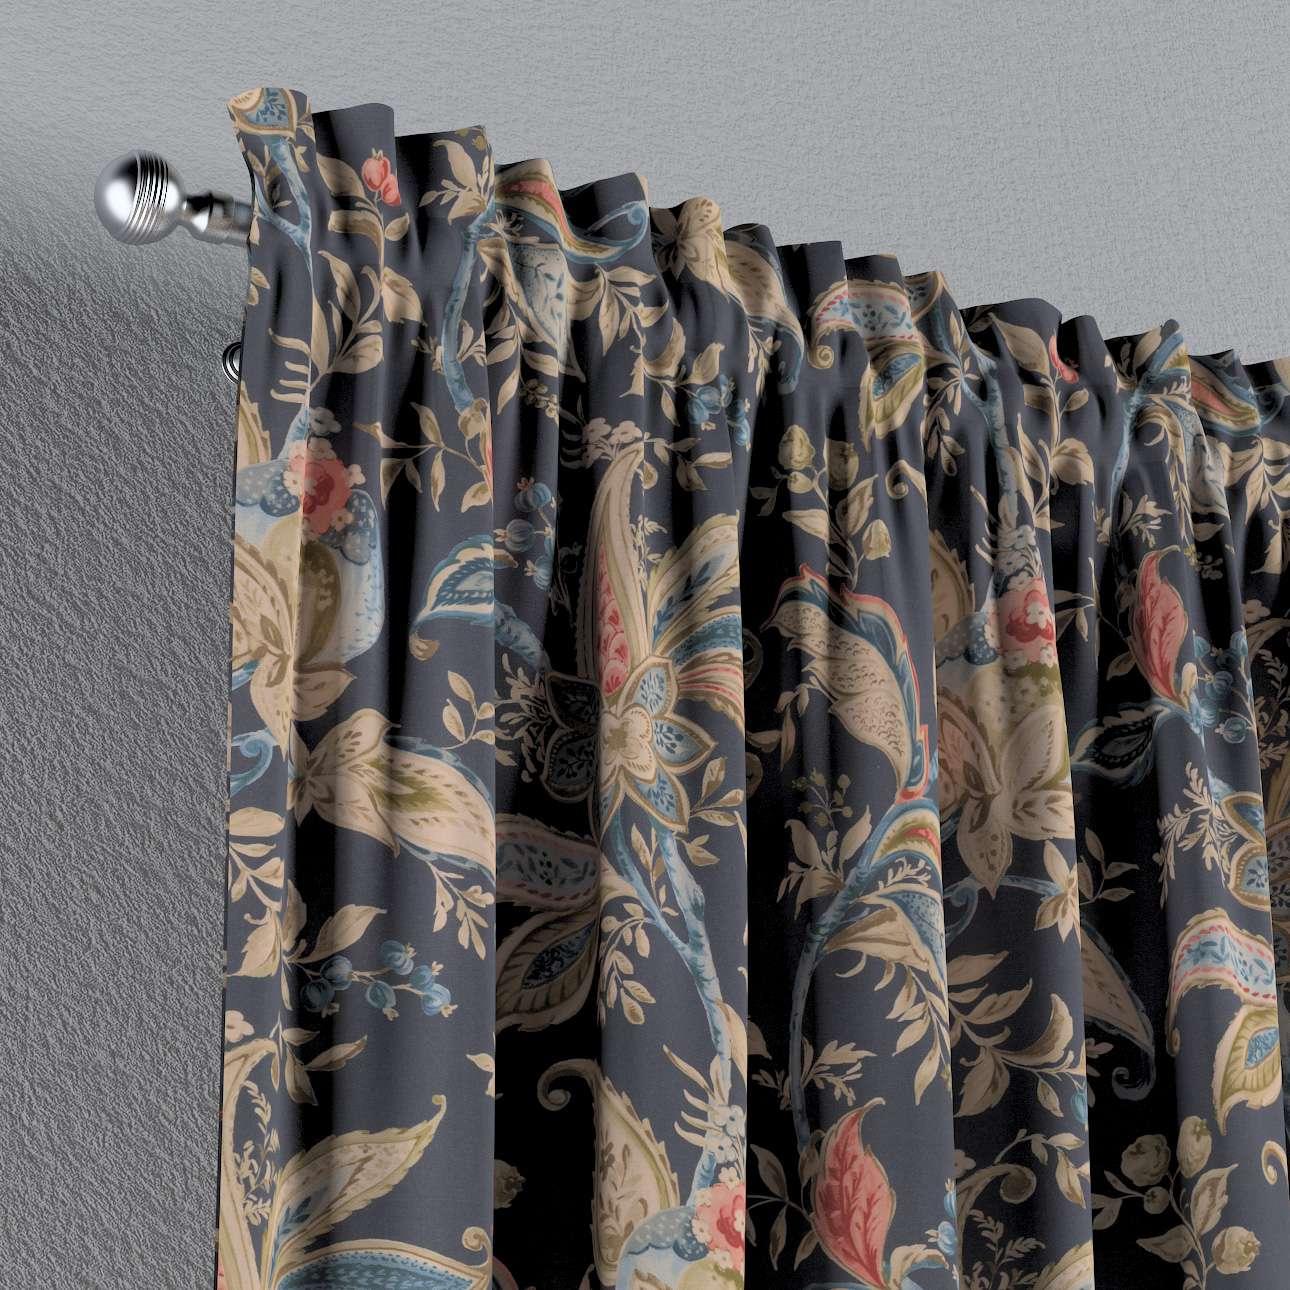 Závěs s tunýlkem a volánkem  v kolekci Gardenia, látka: 142-19